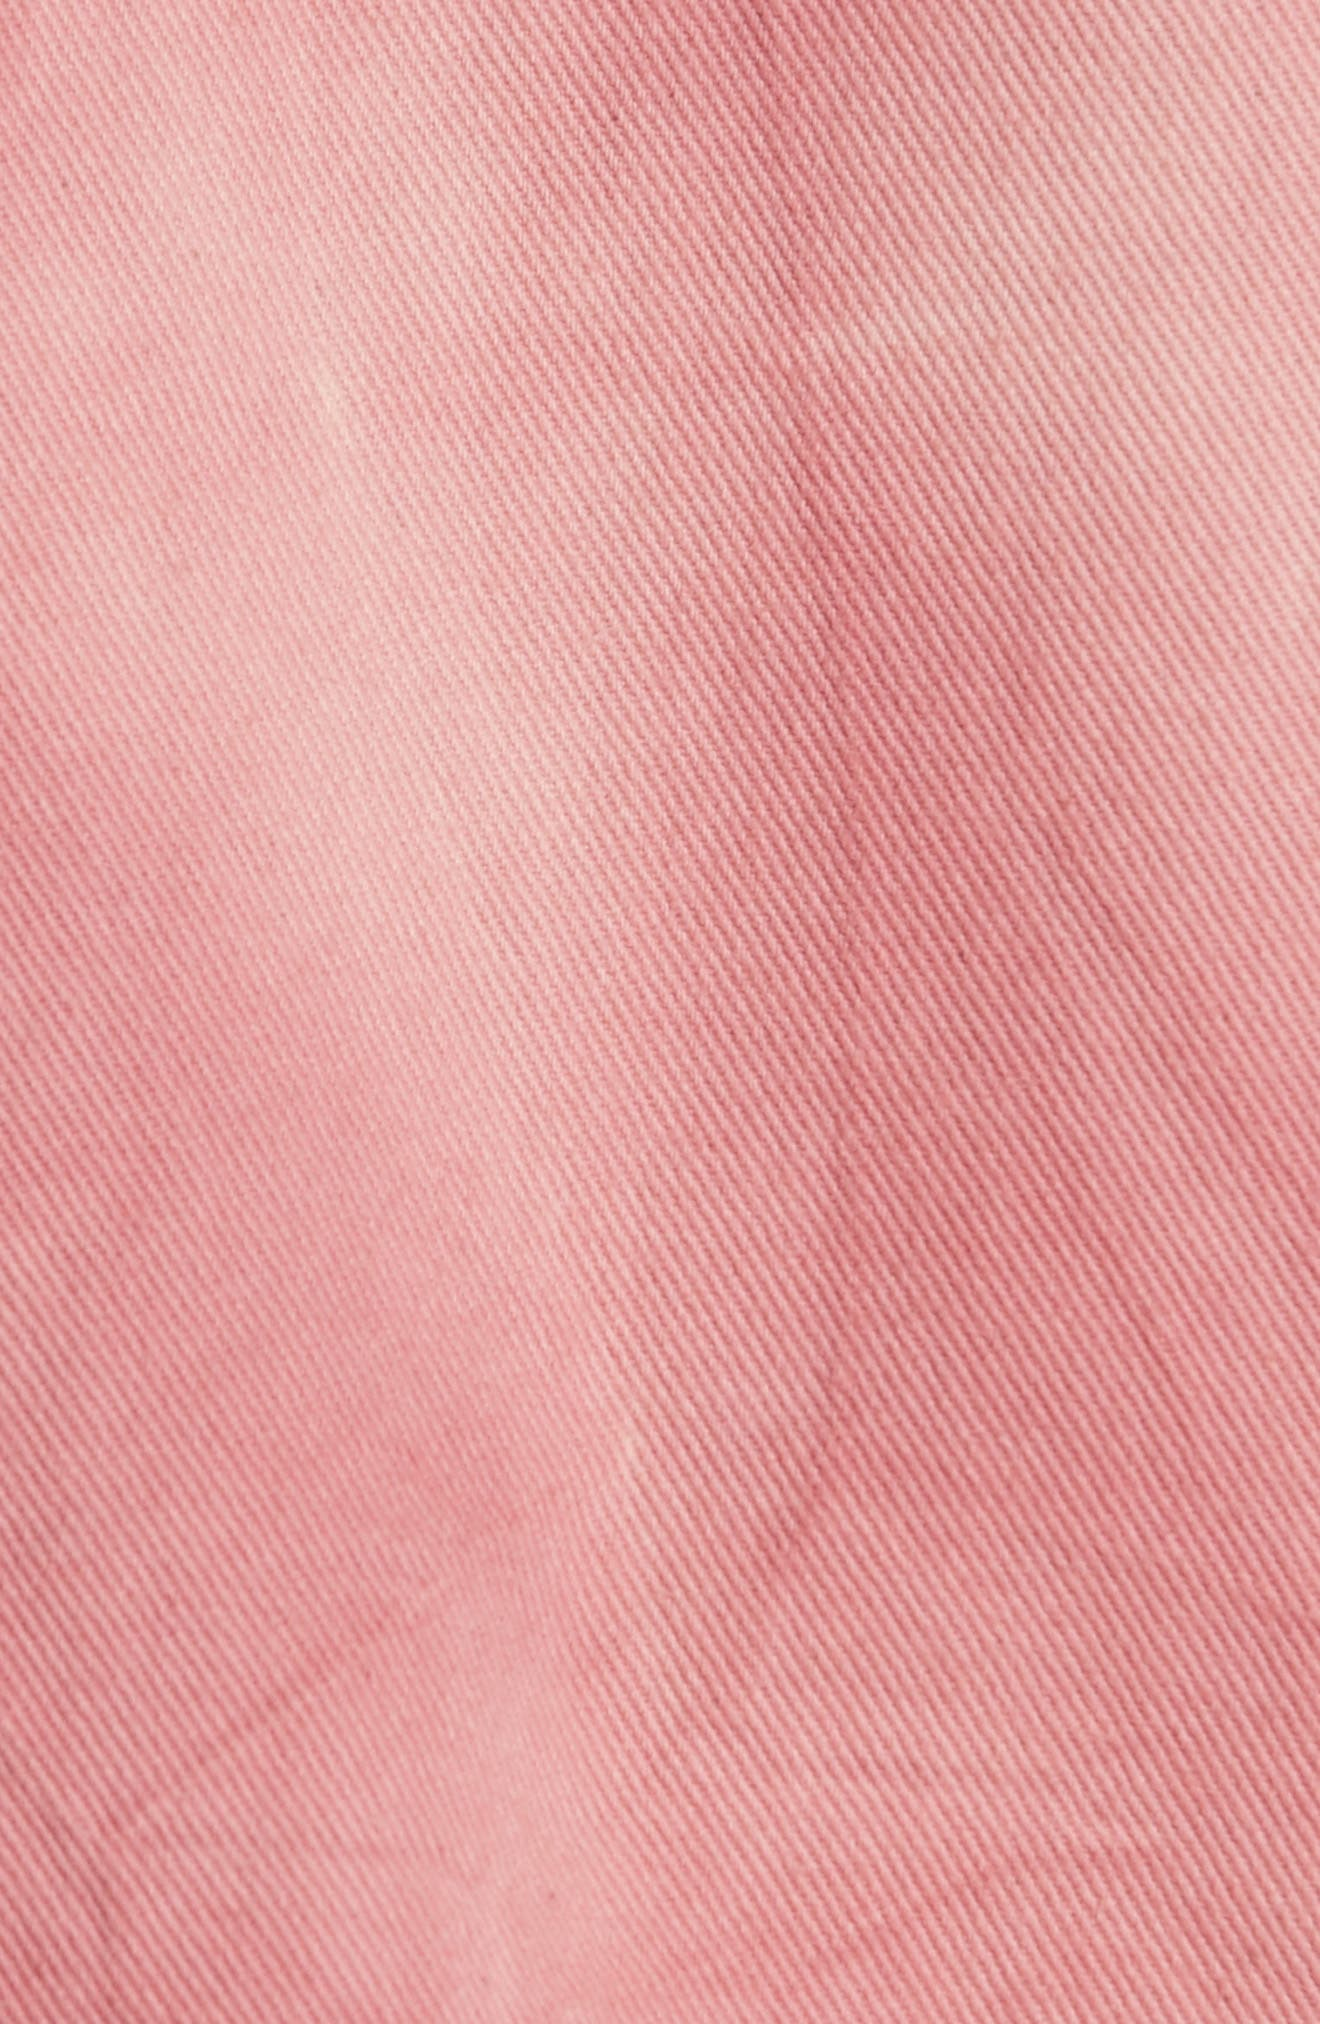 Dye Jacket,                             Alternate thumbnail 5, color,                             Pink